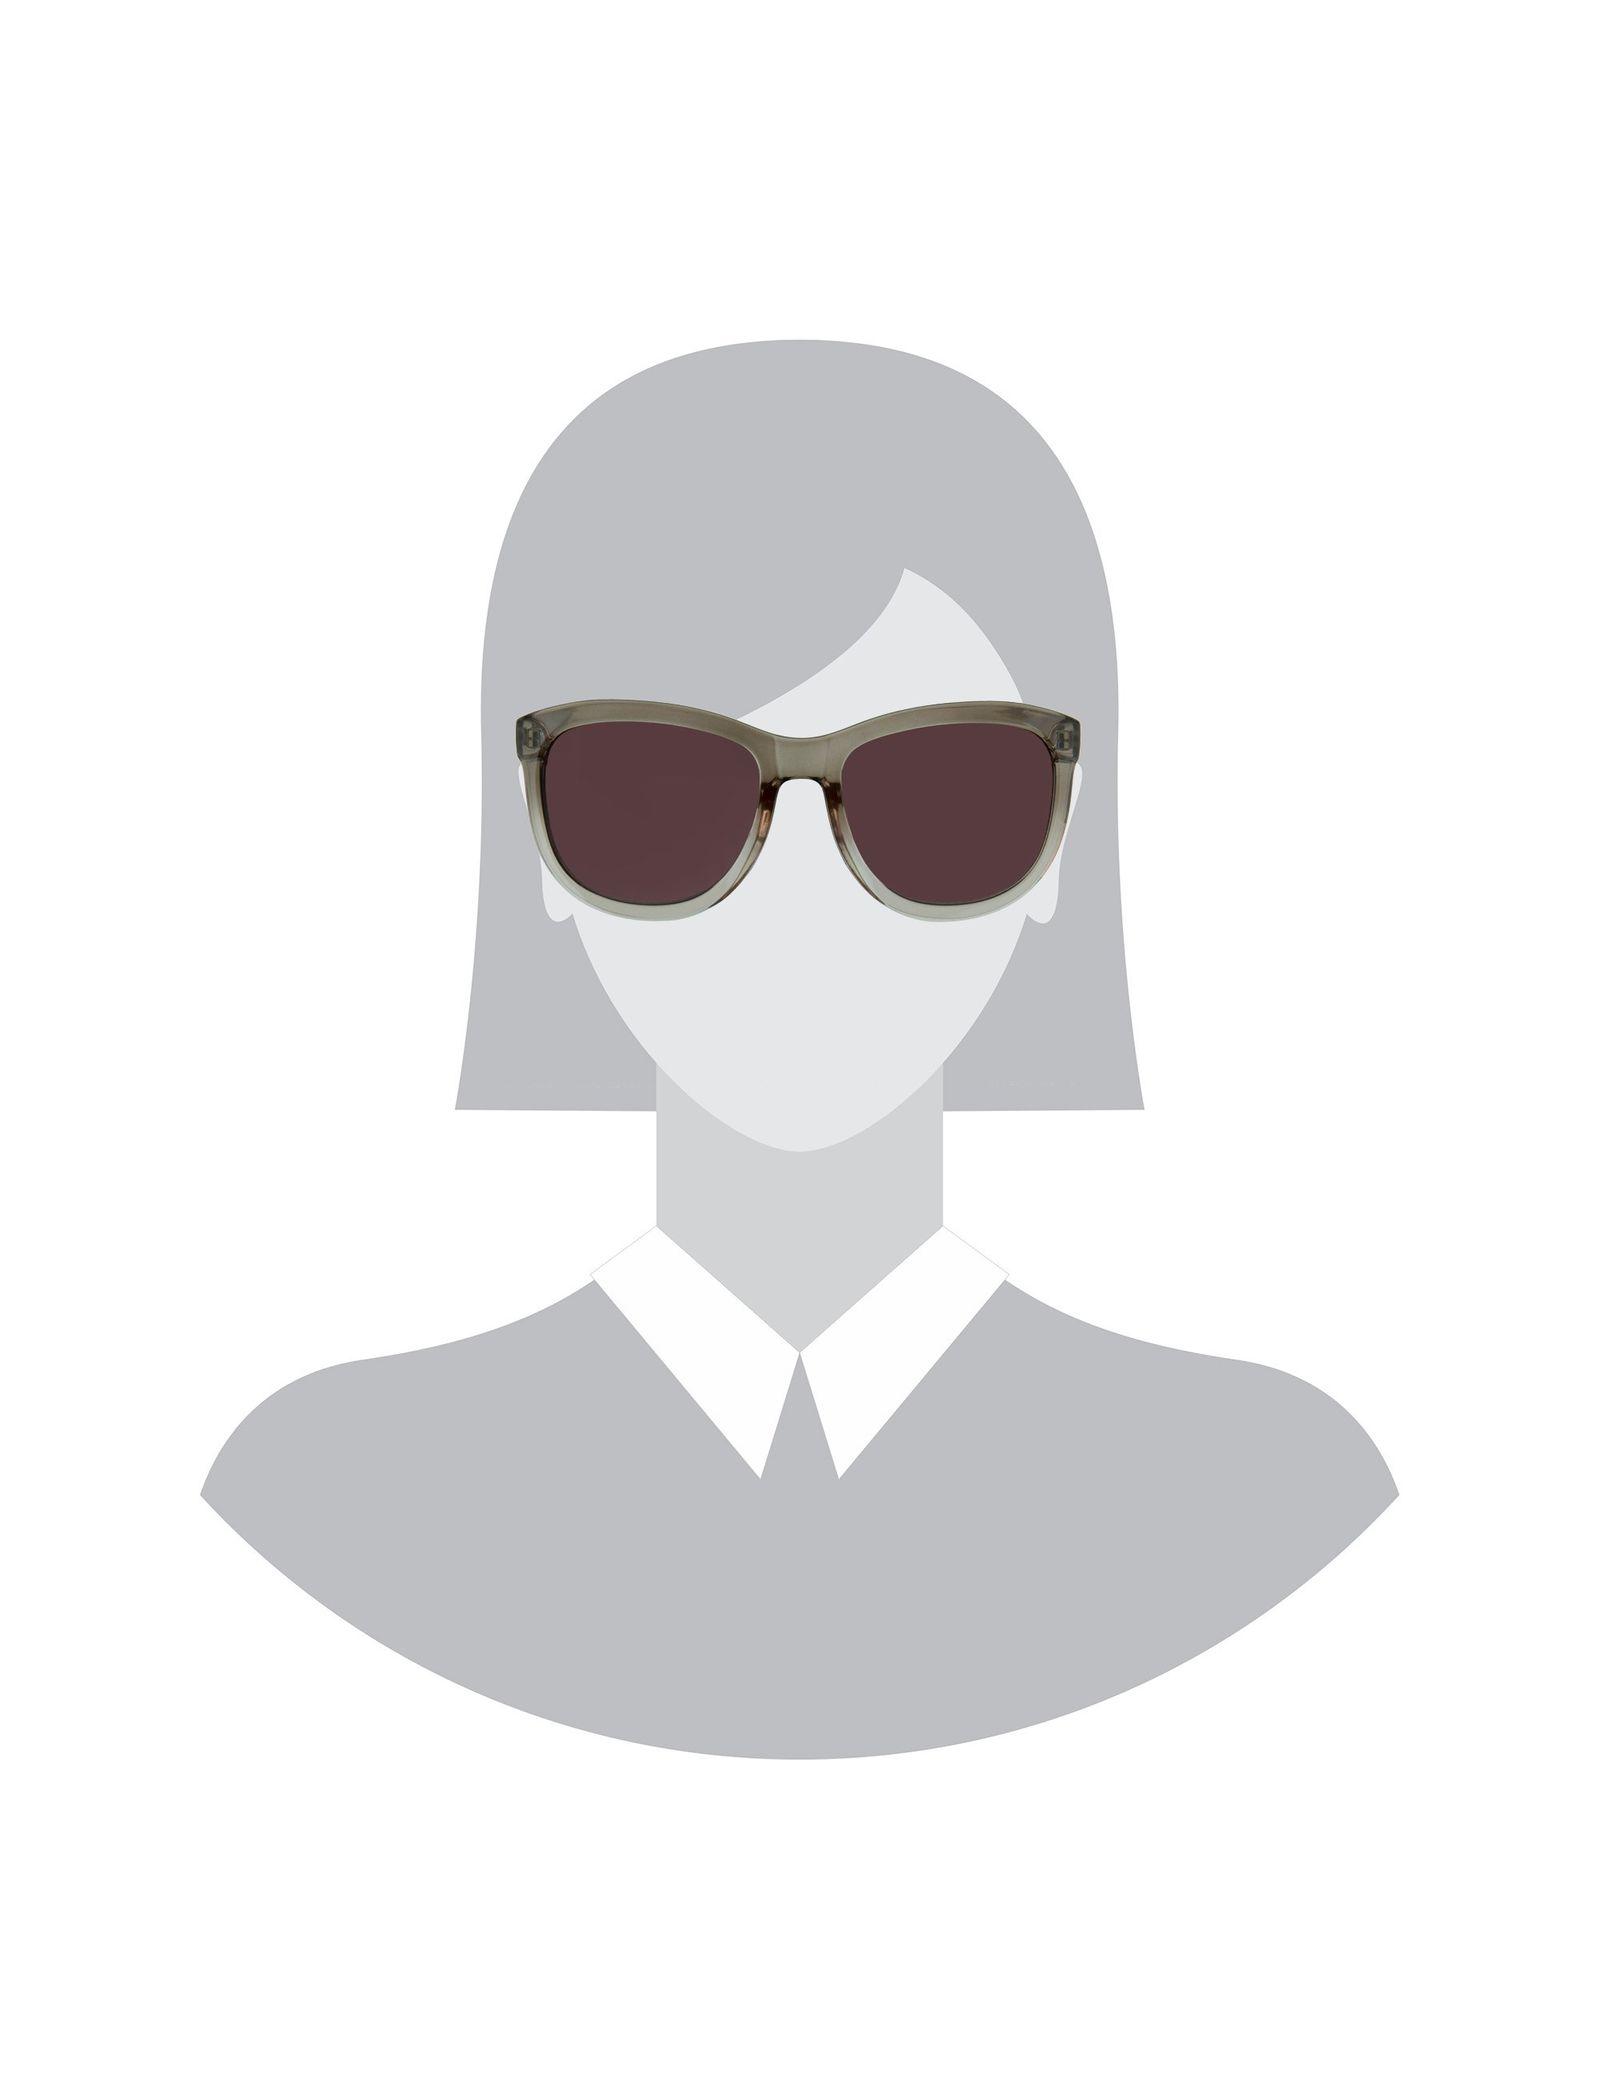 عینک آفتابی ویفرر زنانه - پی سز - قهوه اي  - 5